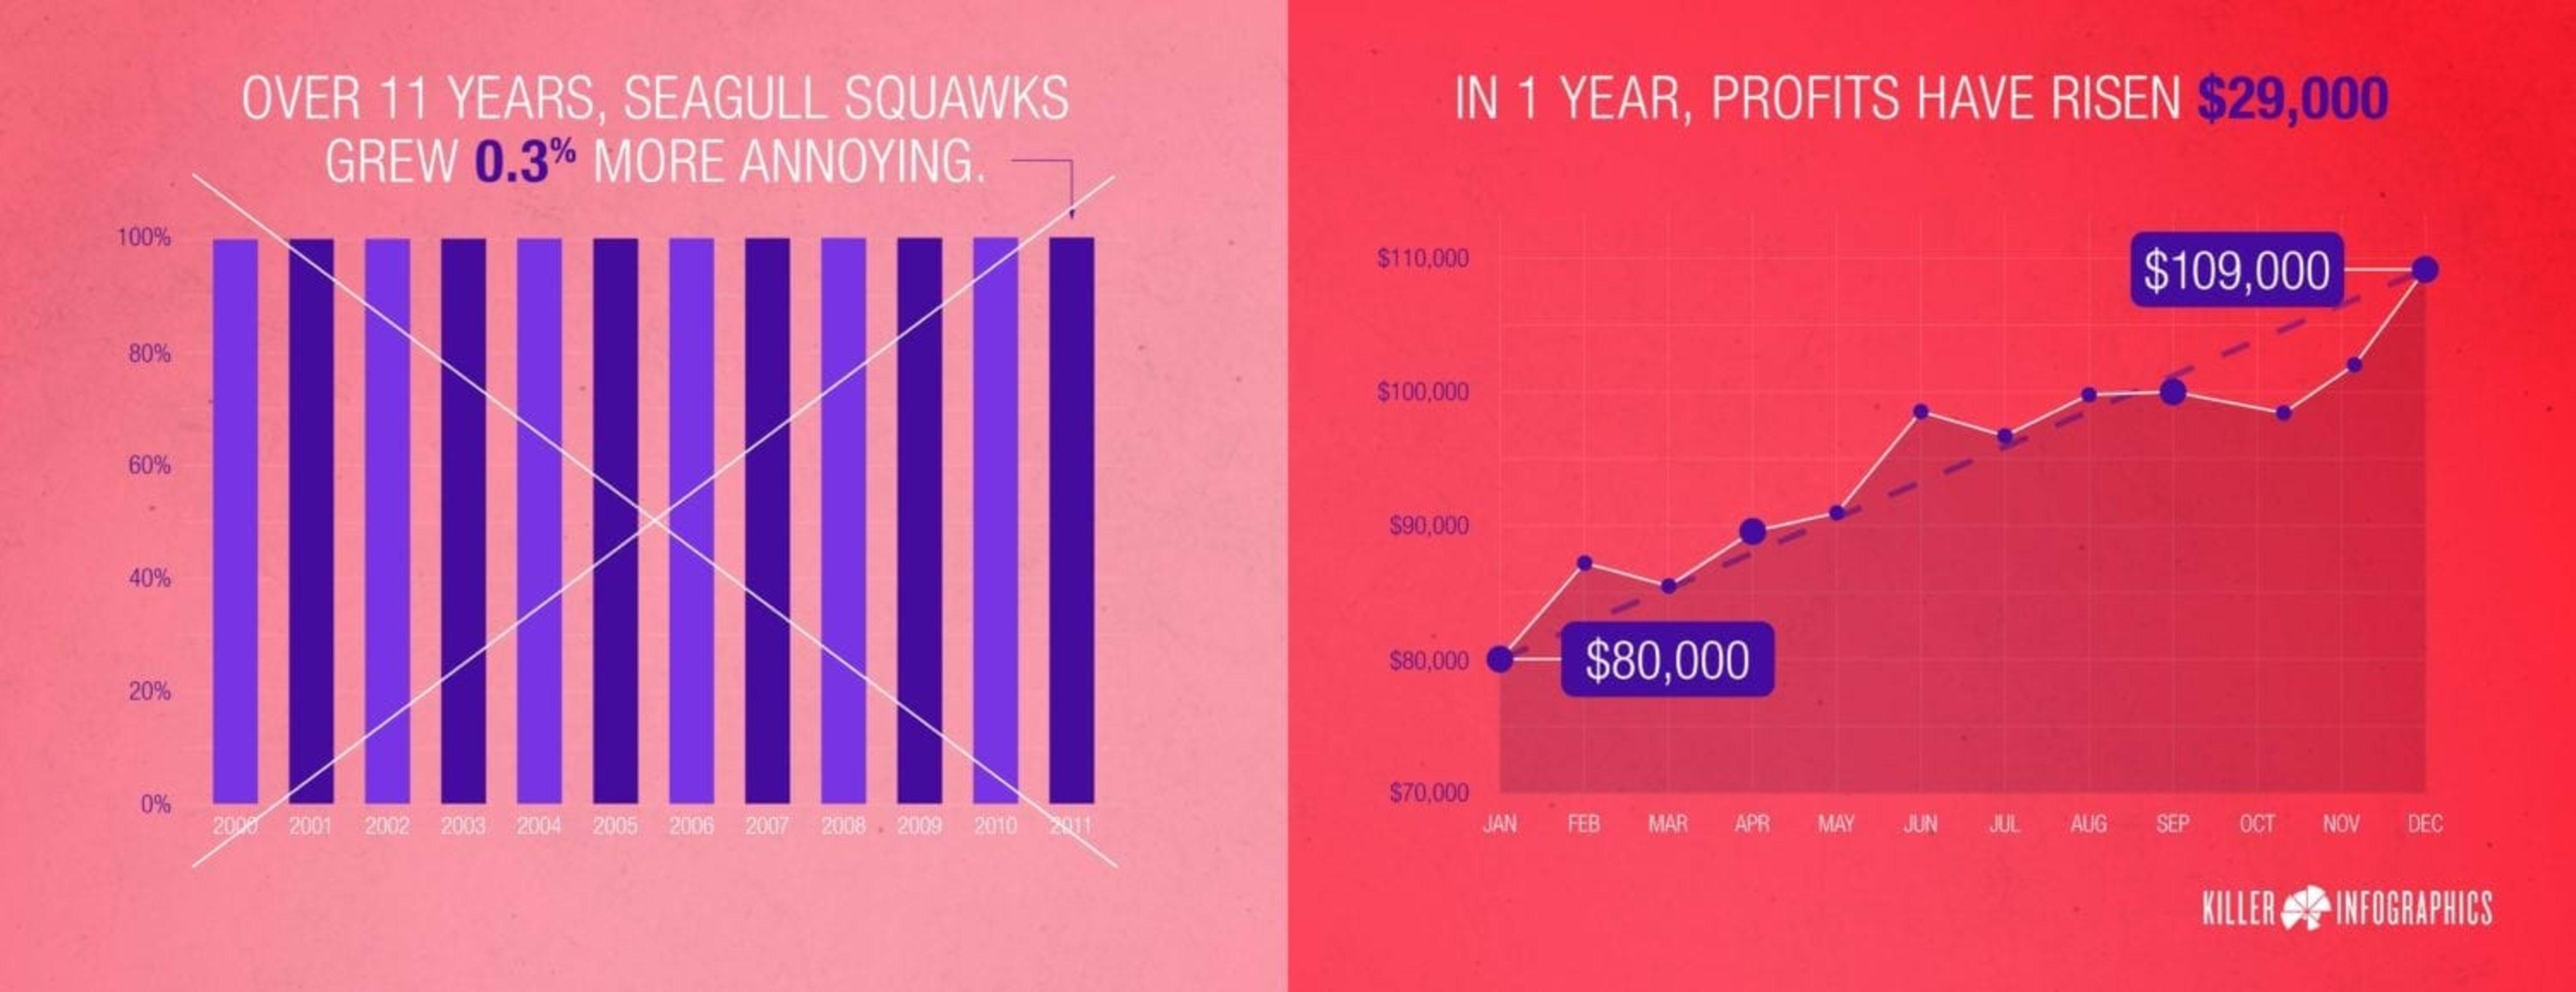 Effective-Data-Visualization-Seagull-Squawk-Profits